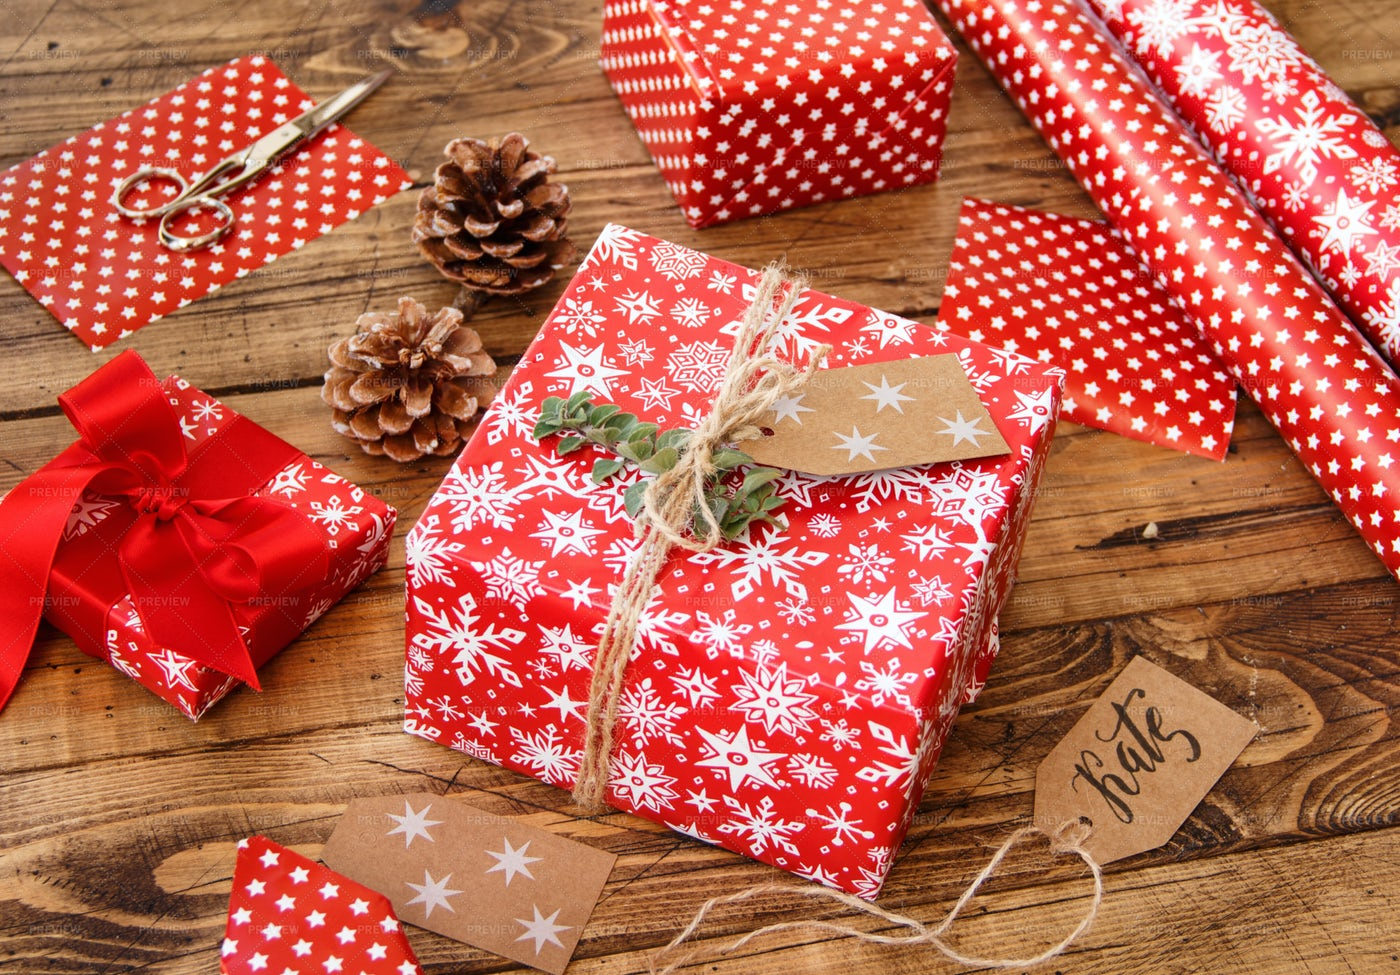 Wrapped Christmas Presents: Stock Photos